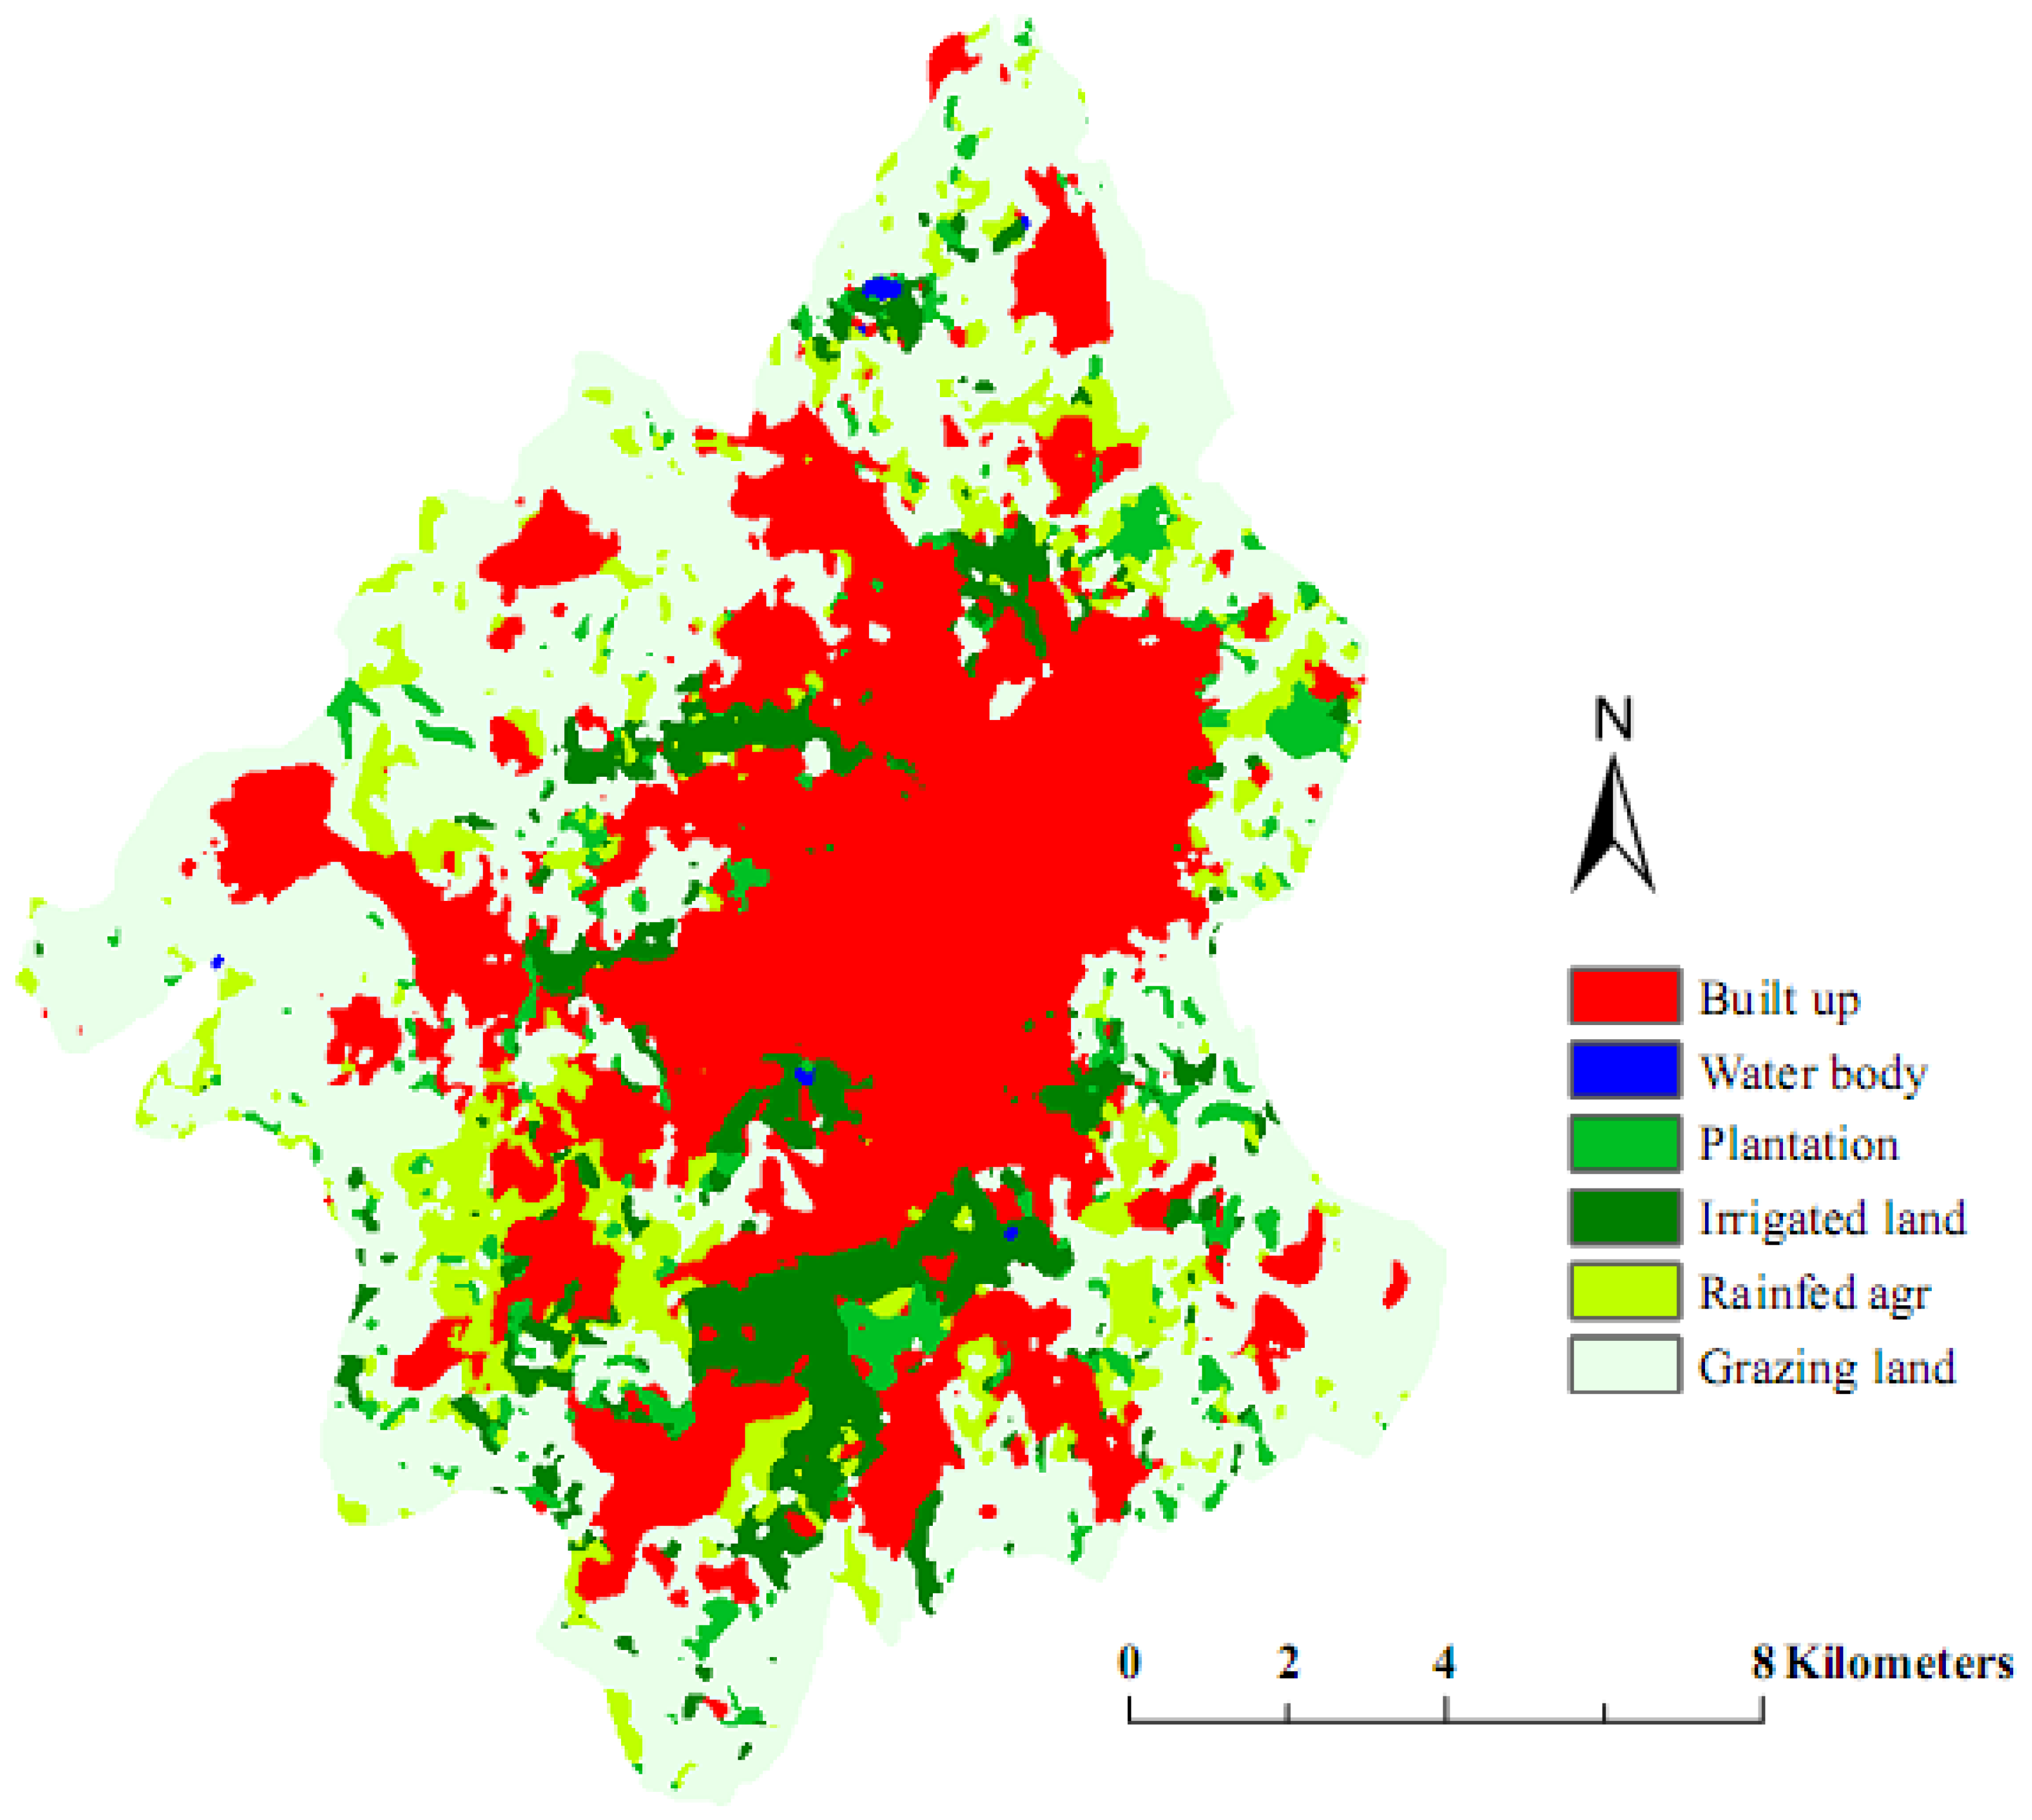 Remote Sensing | Free Full-Text | Urban Sprawl Analysis and